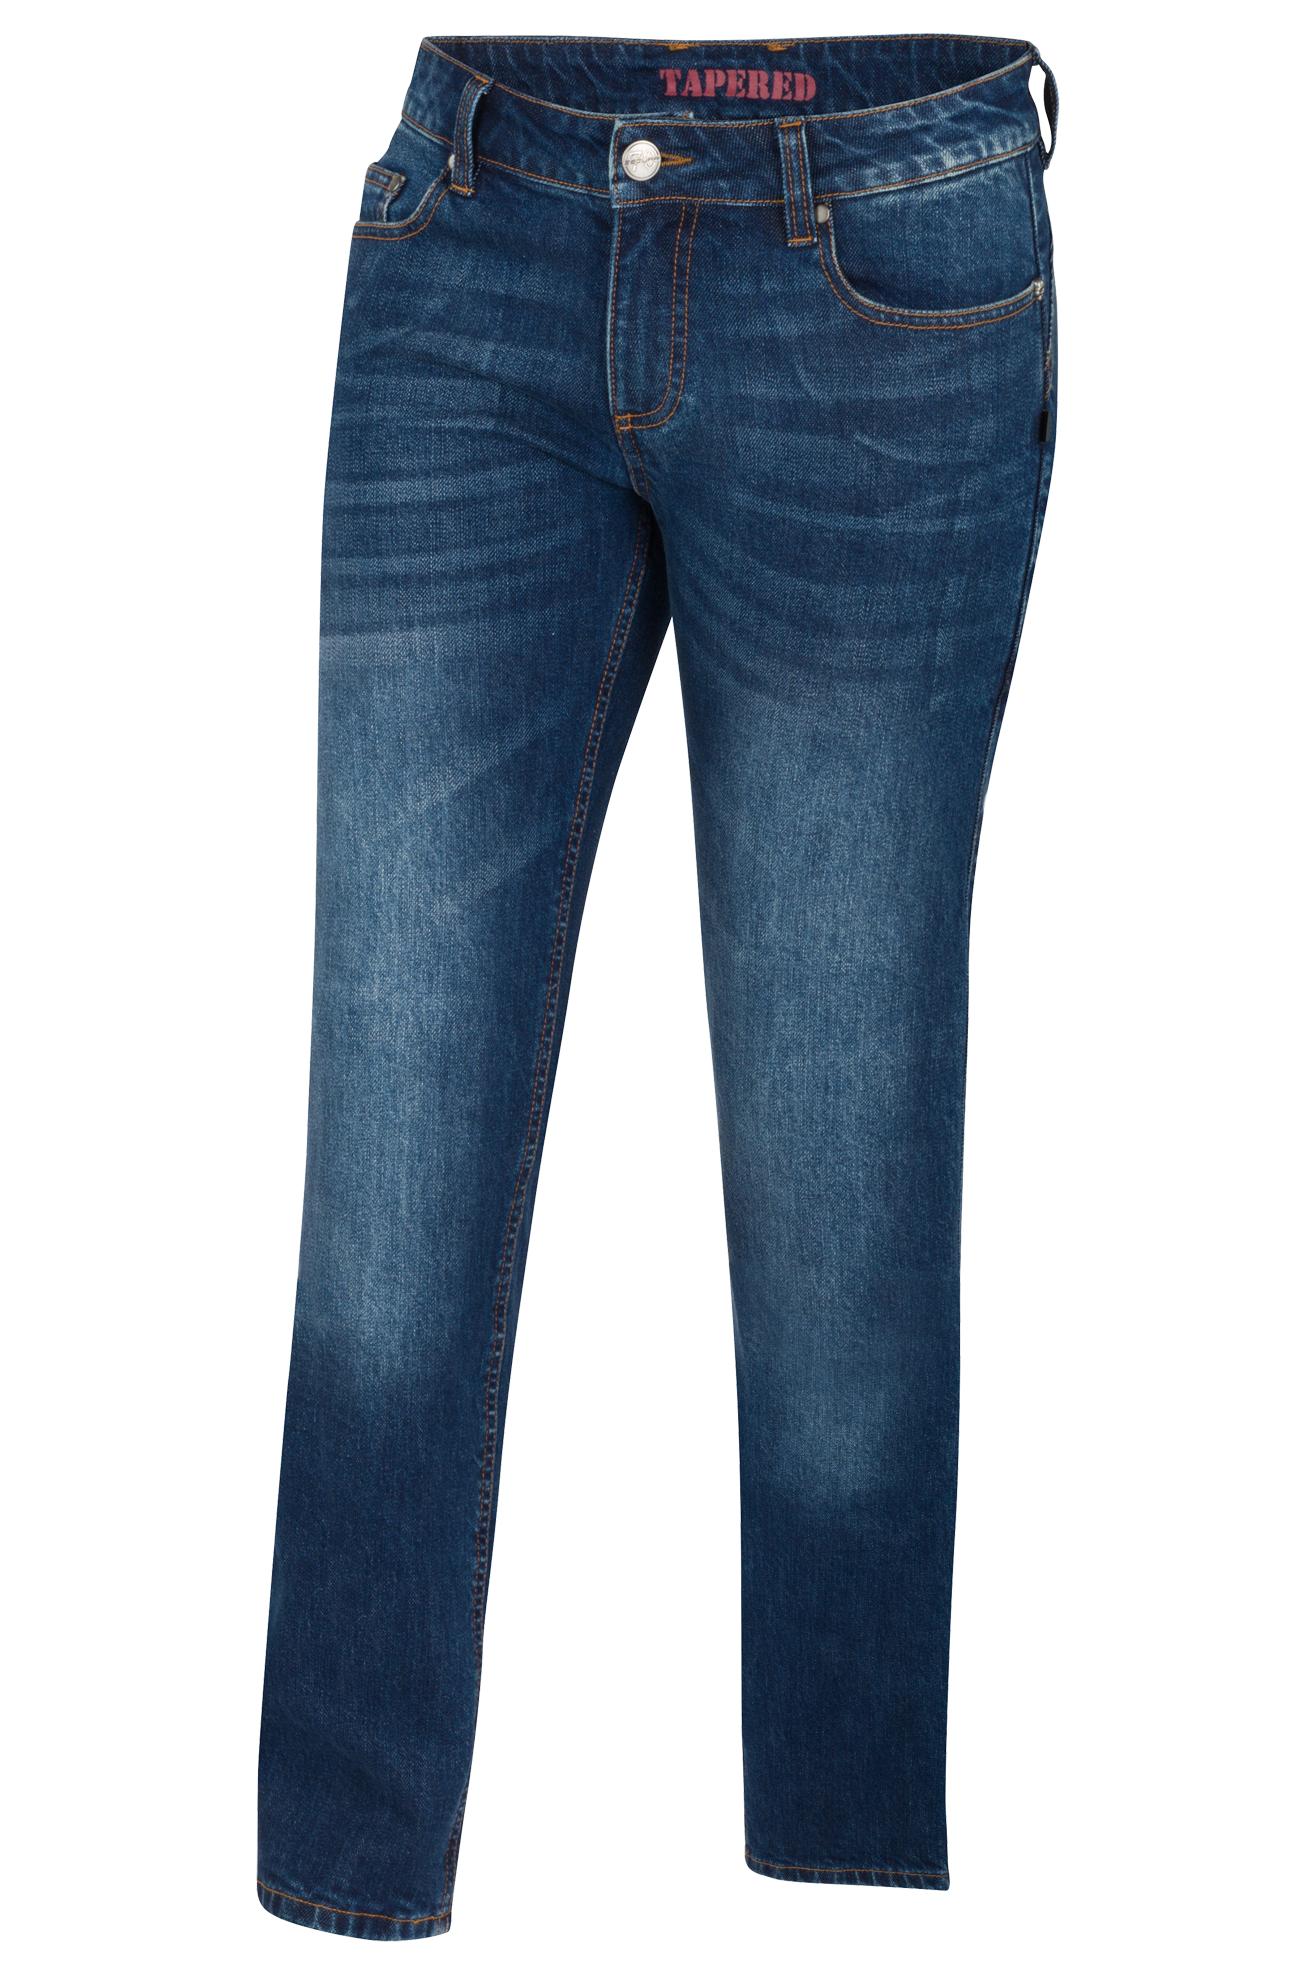 Segura Jeans Moto Donna  Lady Vertigo Blu Lavato